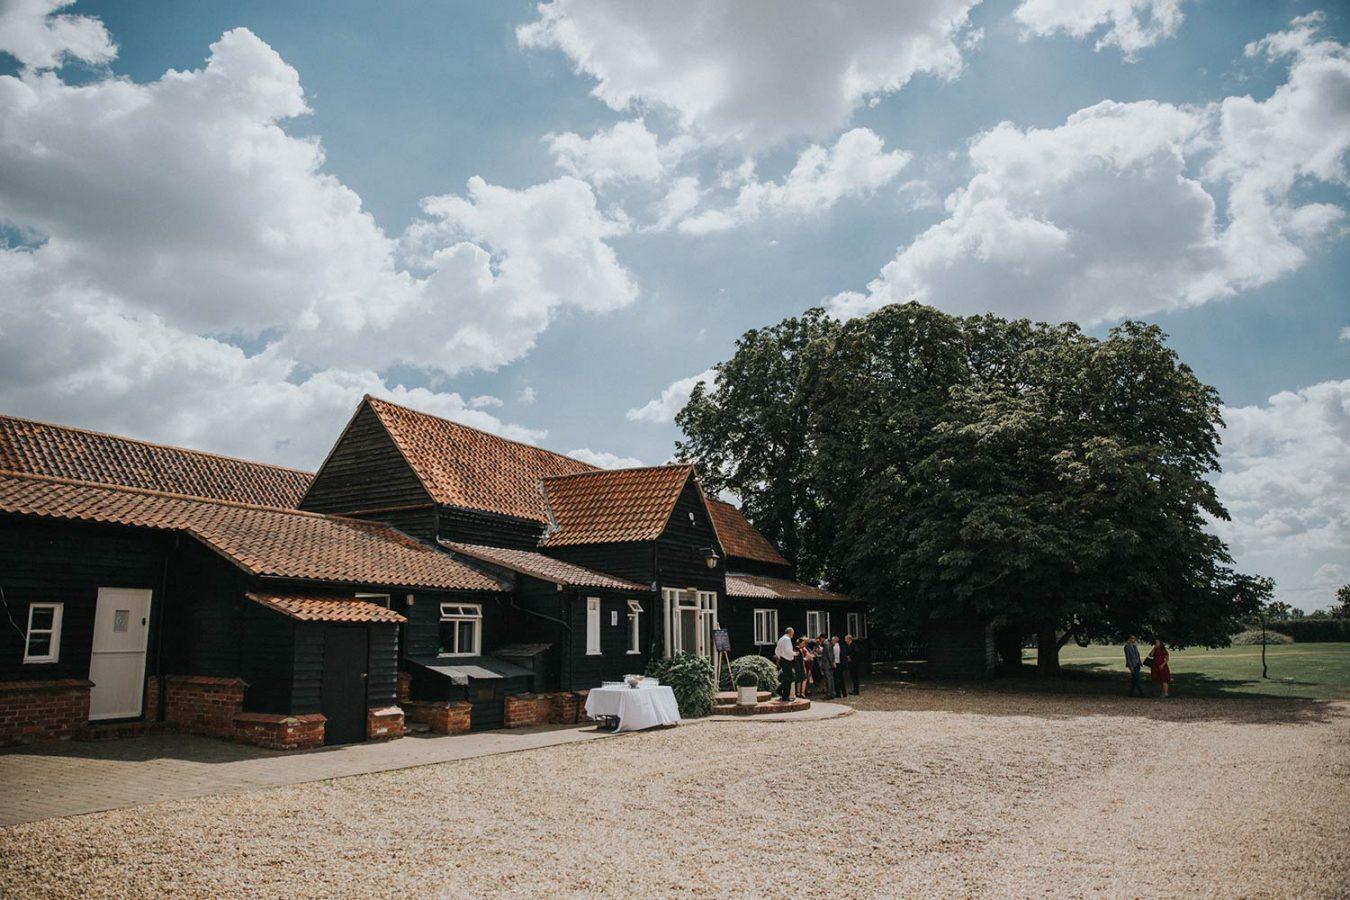 vaulty-manor-wedding-photography-074